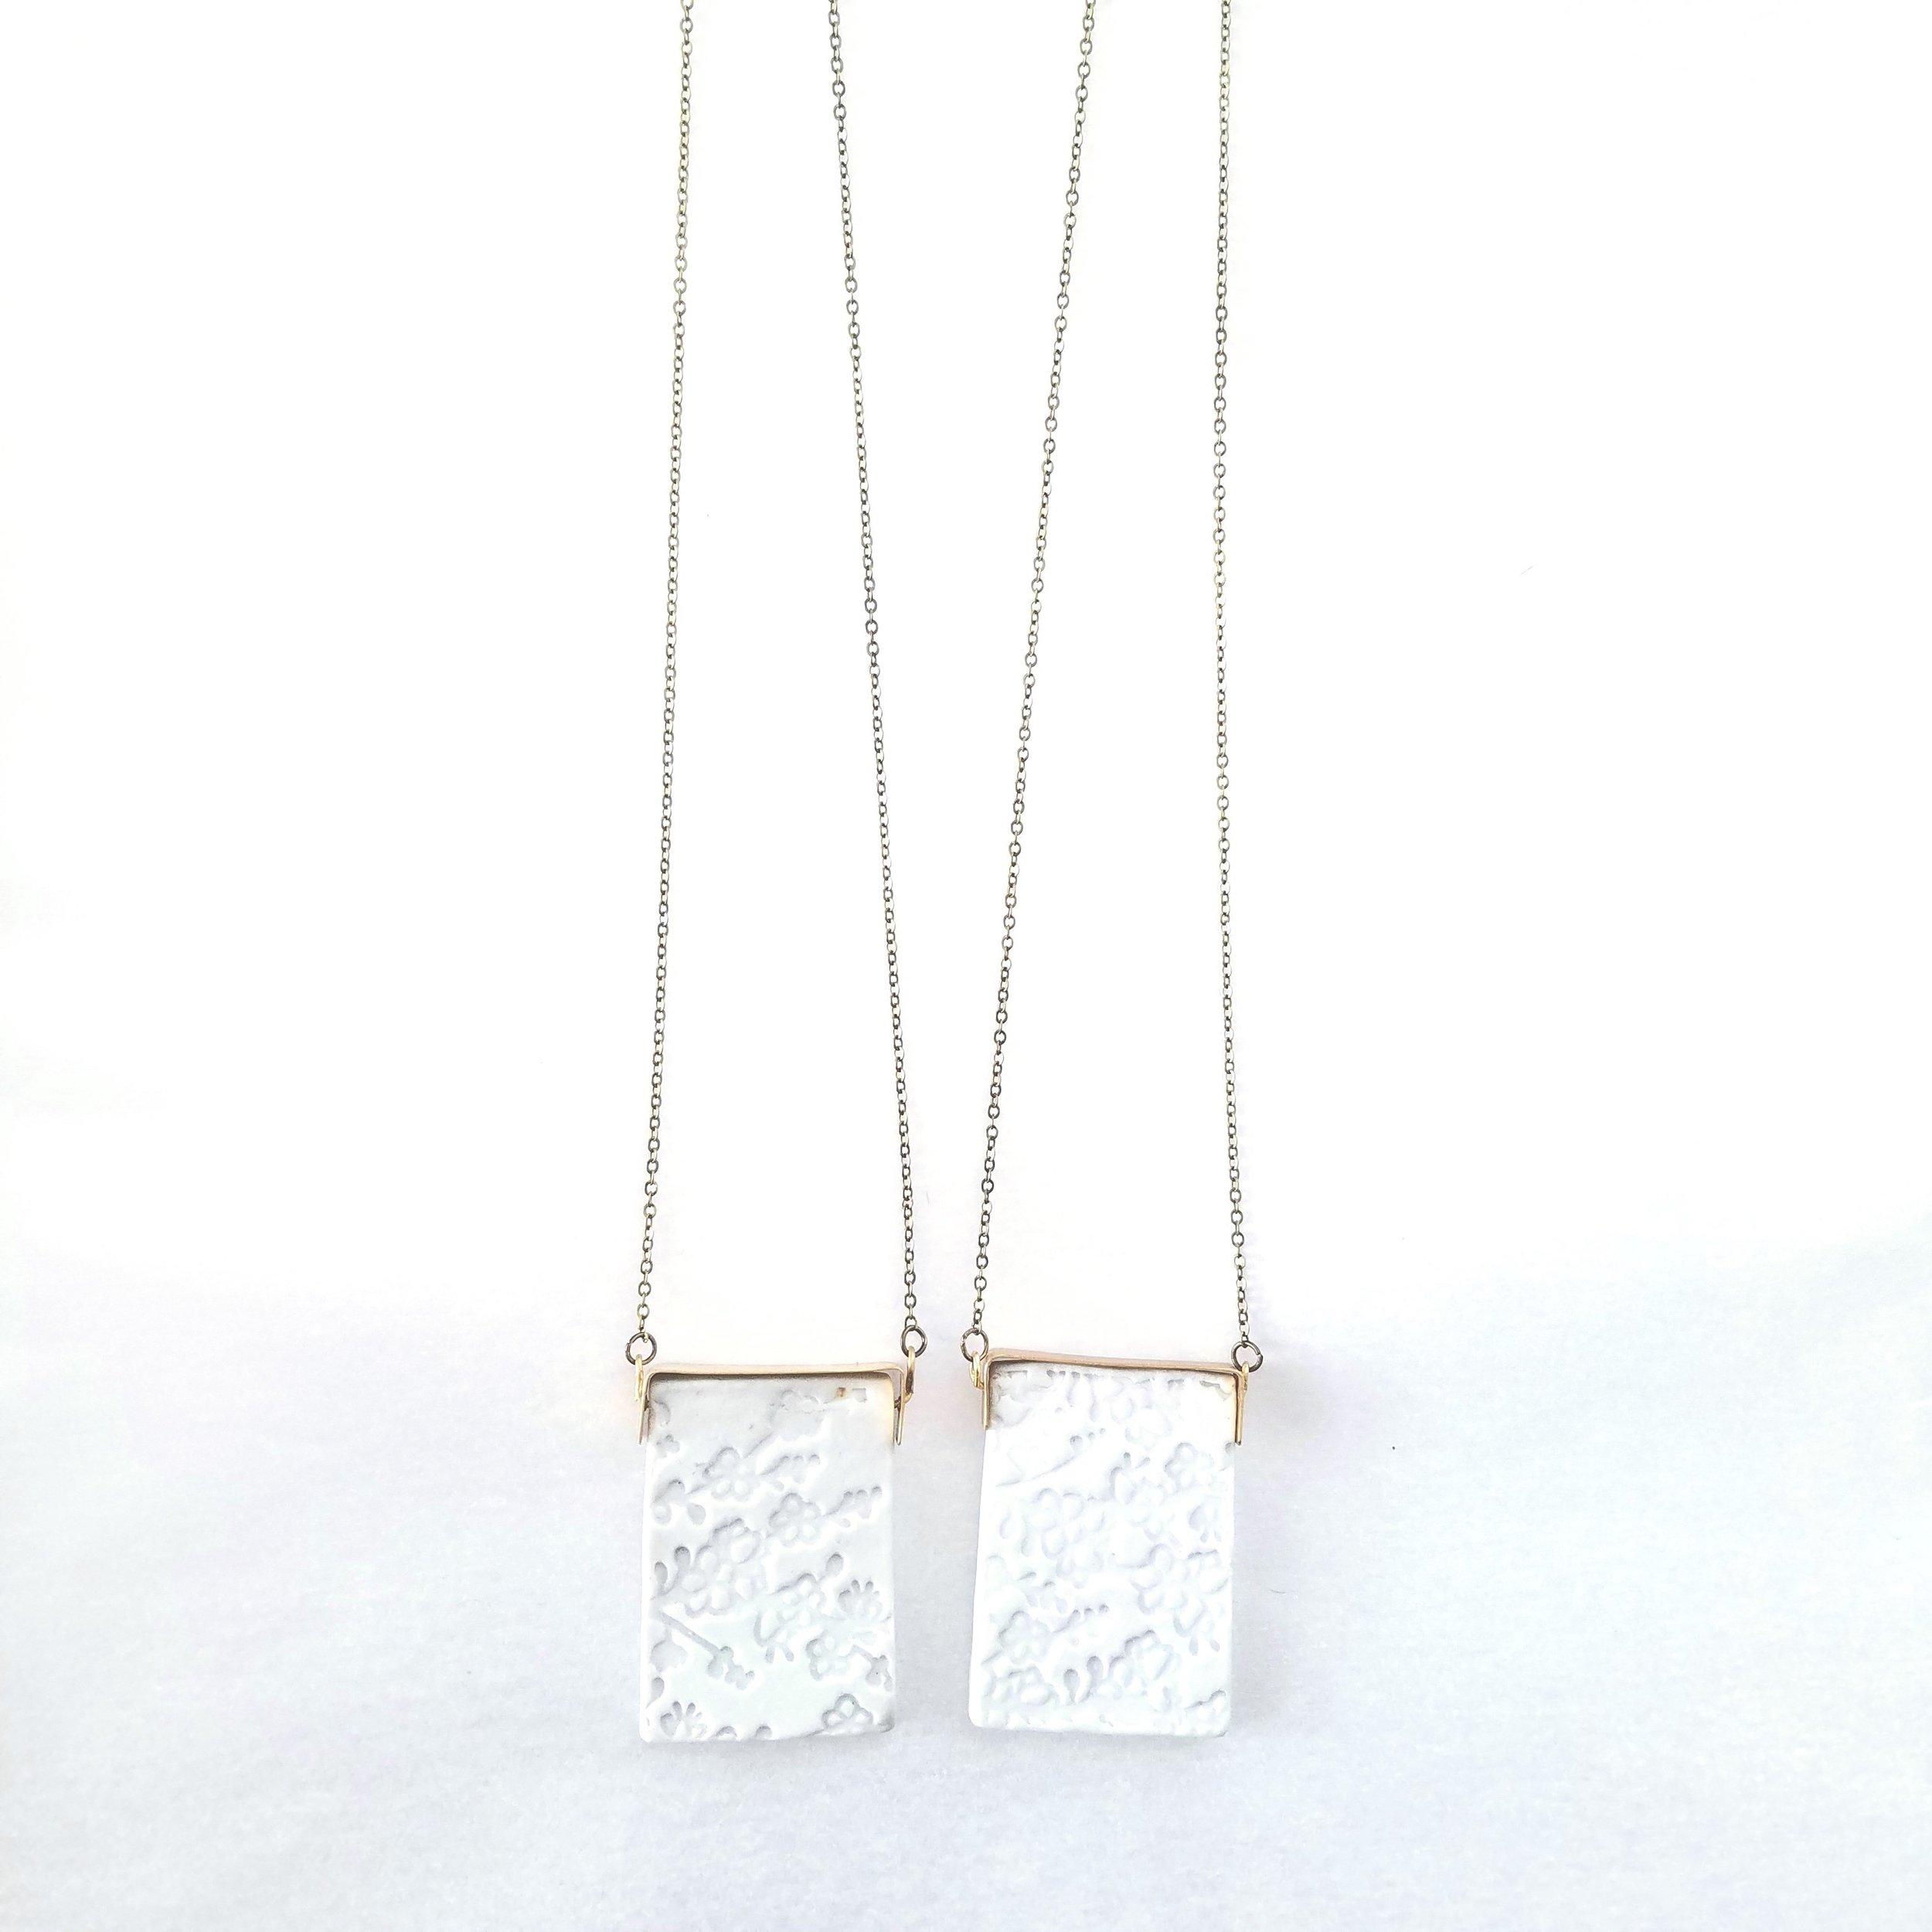 small textured porcelain pendants.jpg